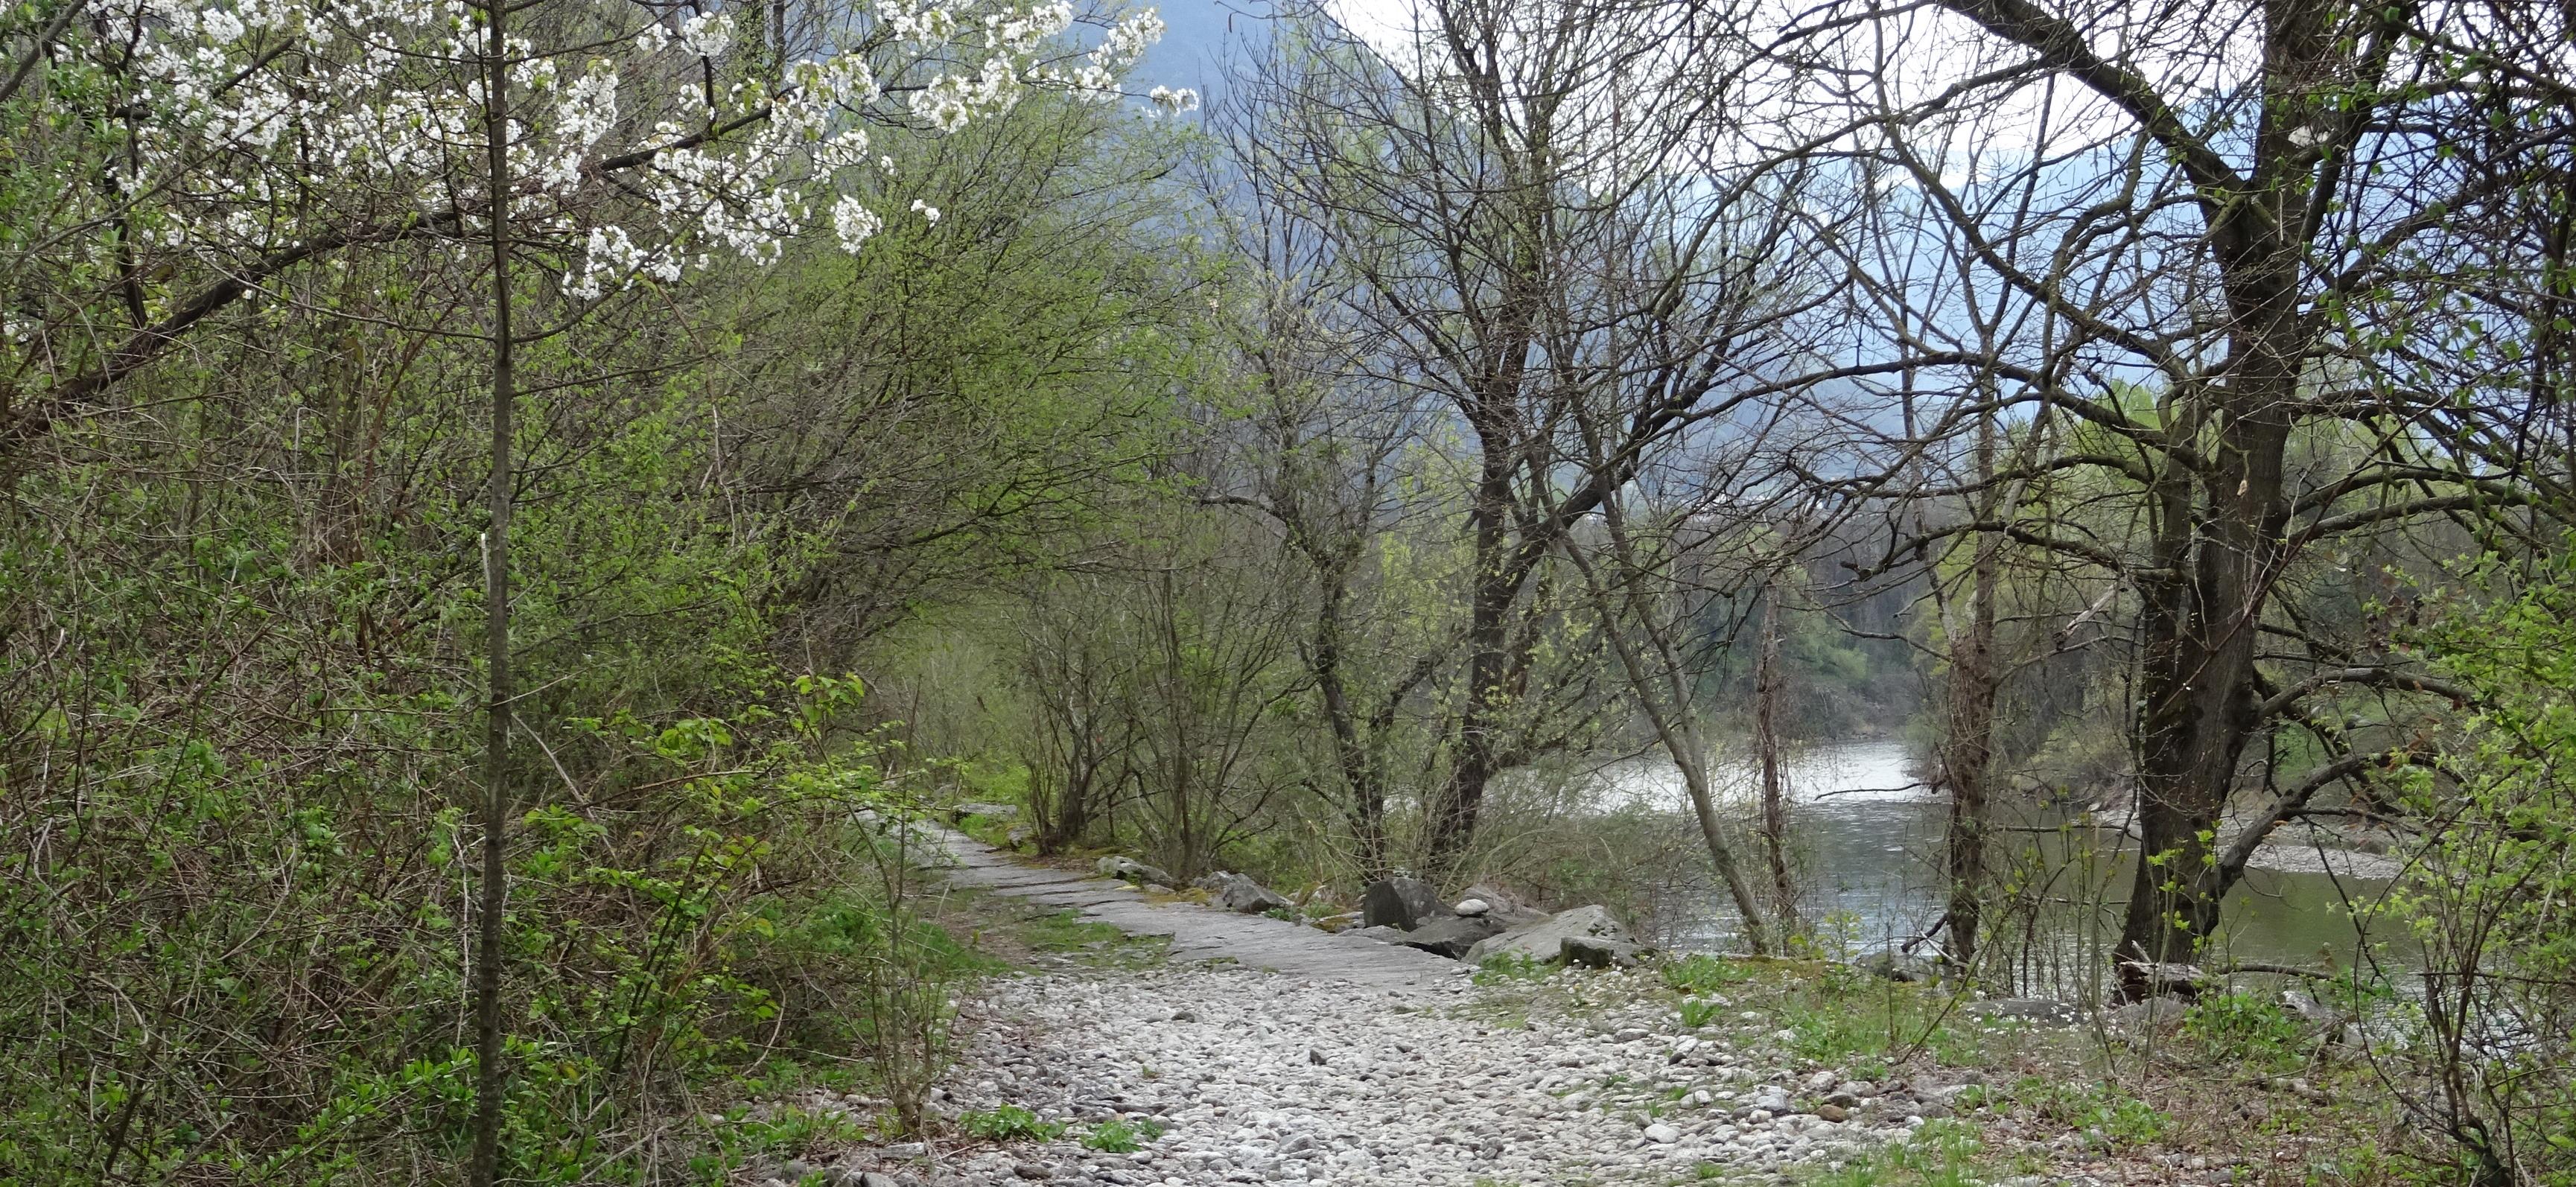 der Uferweg dem Ticino entlang